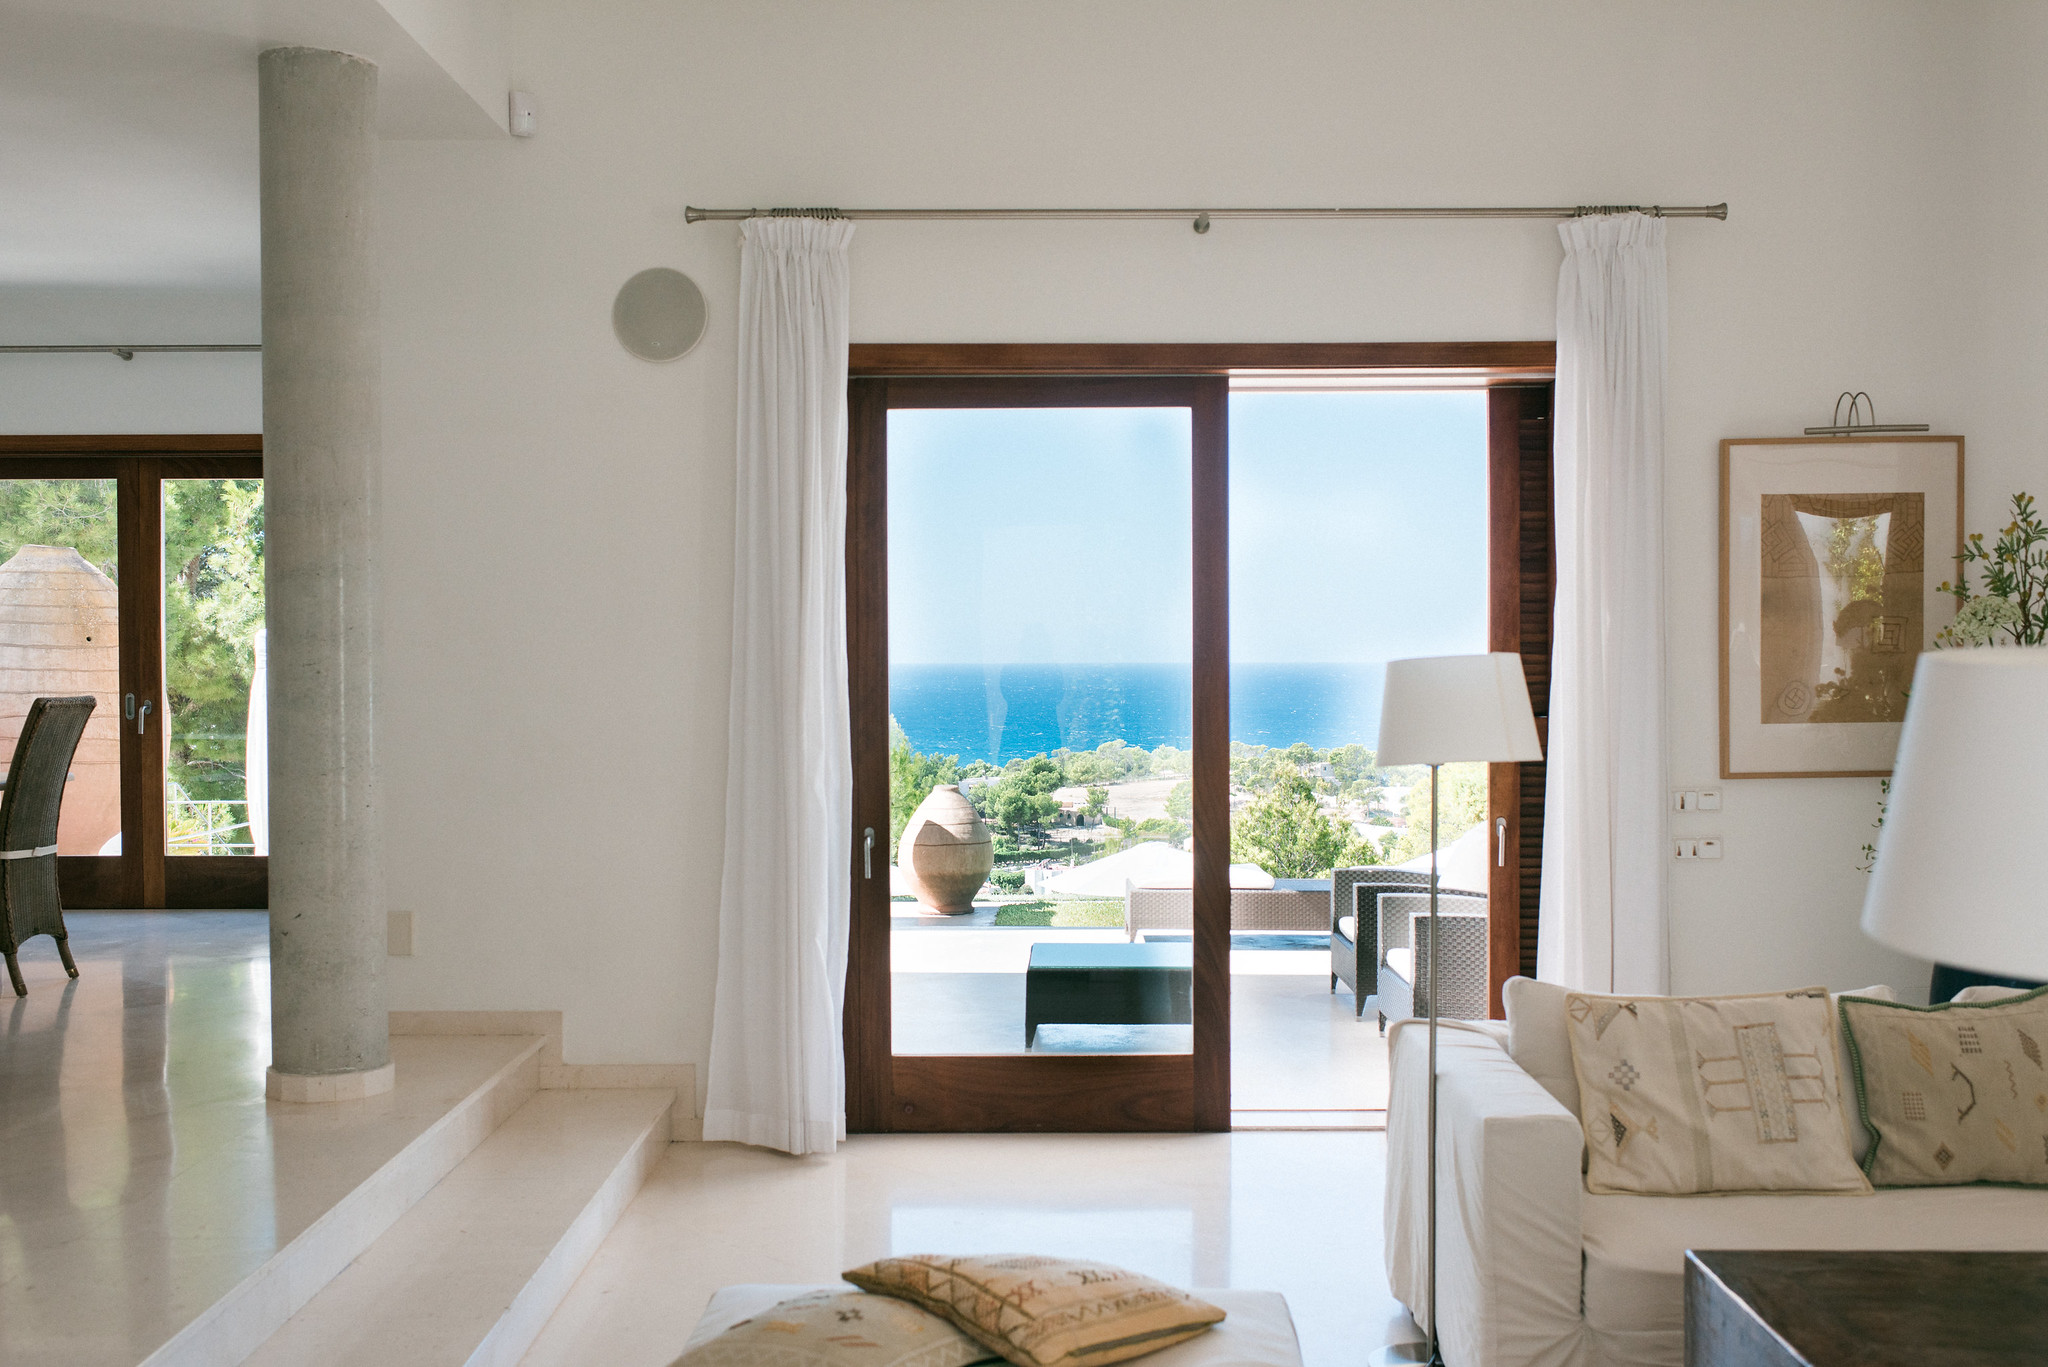 https://www.white-ibiza.com/wp-content/uploads/2020/05/white-ibiza-villas-can-ava-lounge.jpg